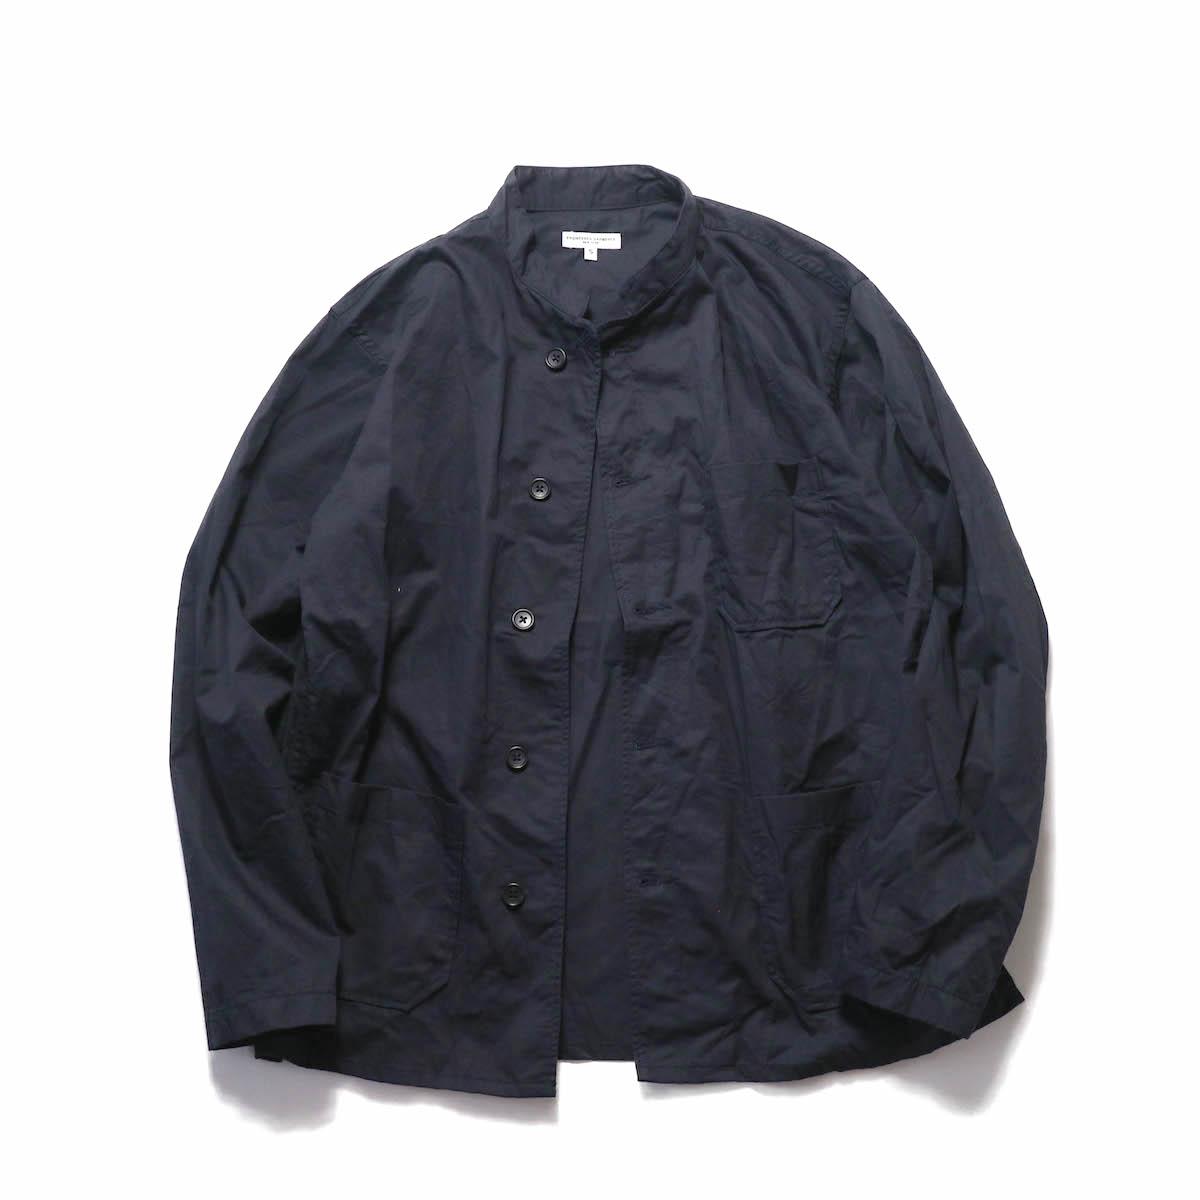 Engineered Garments / Dayton Shirt -High Count Twill -Dk.Navy